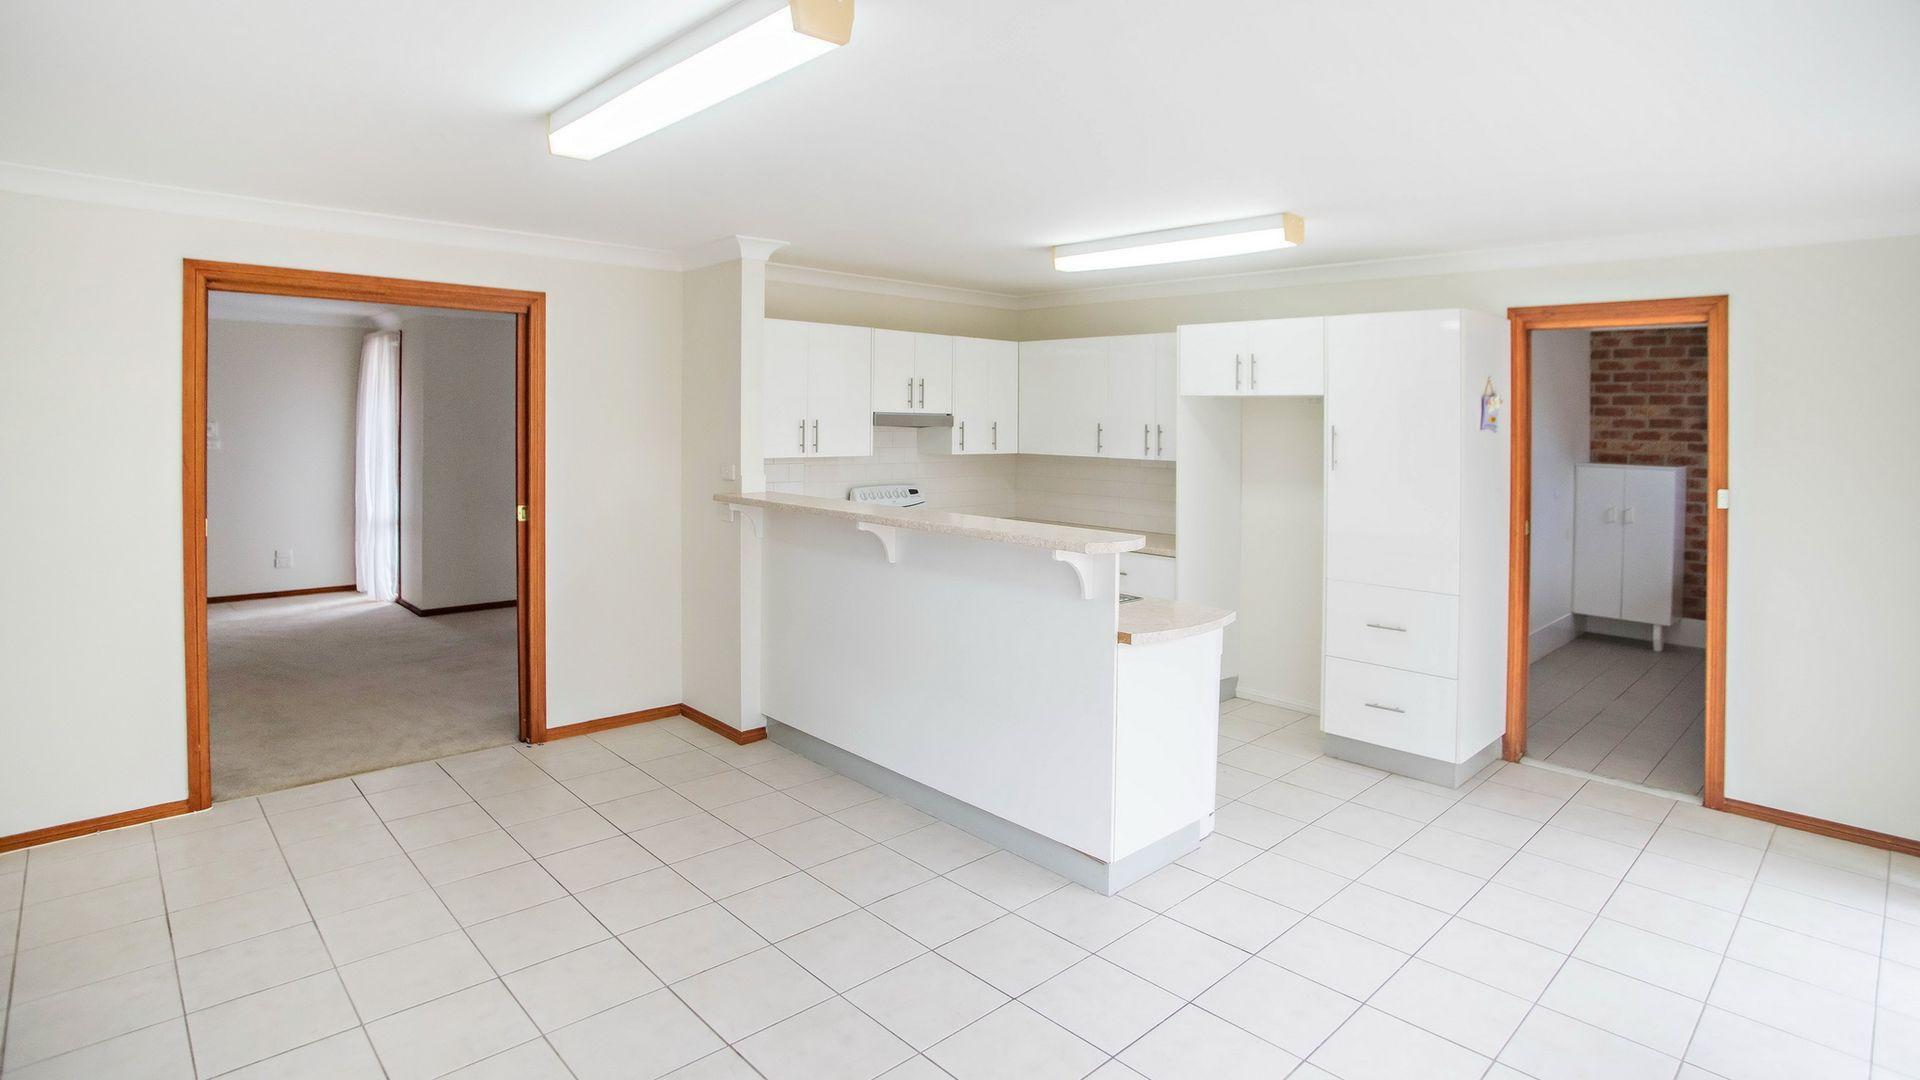 2/12 Samantha Close, Taree NSW 2430, Image 2